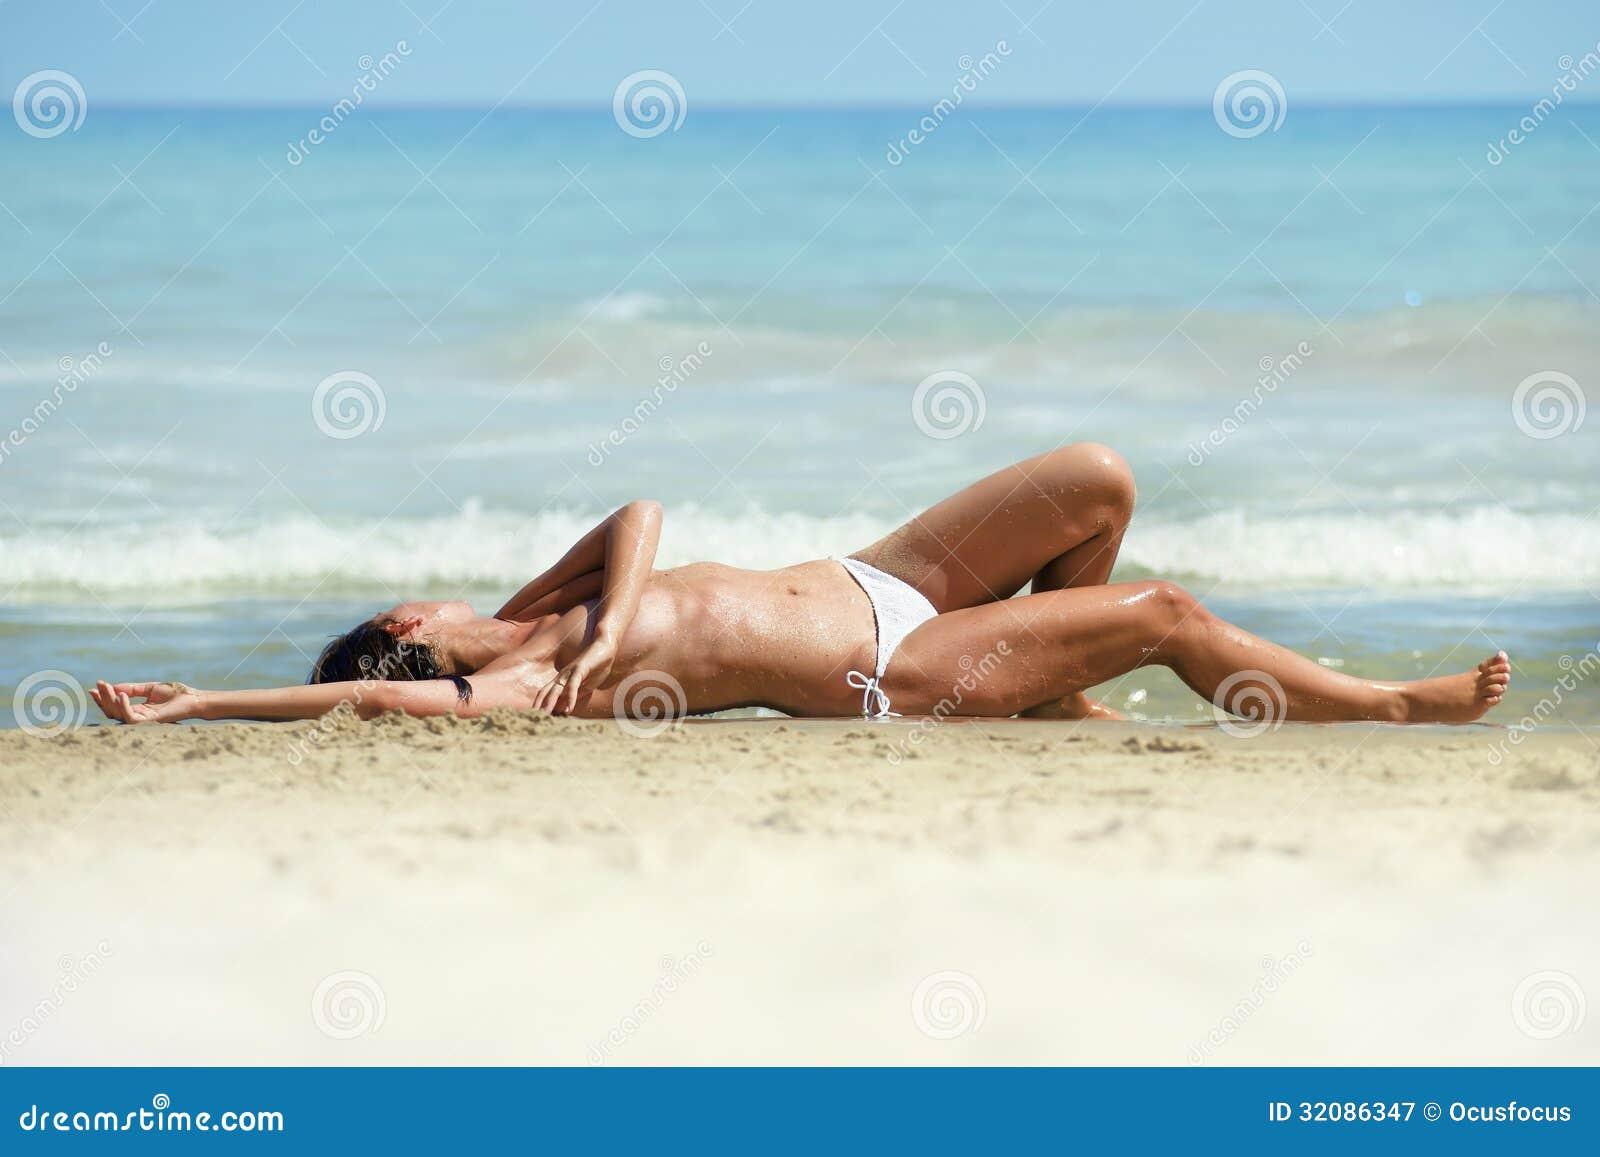 more-plyazh-bikini-topless-masturbiruet-i-oblizivaet-paltsi